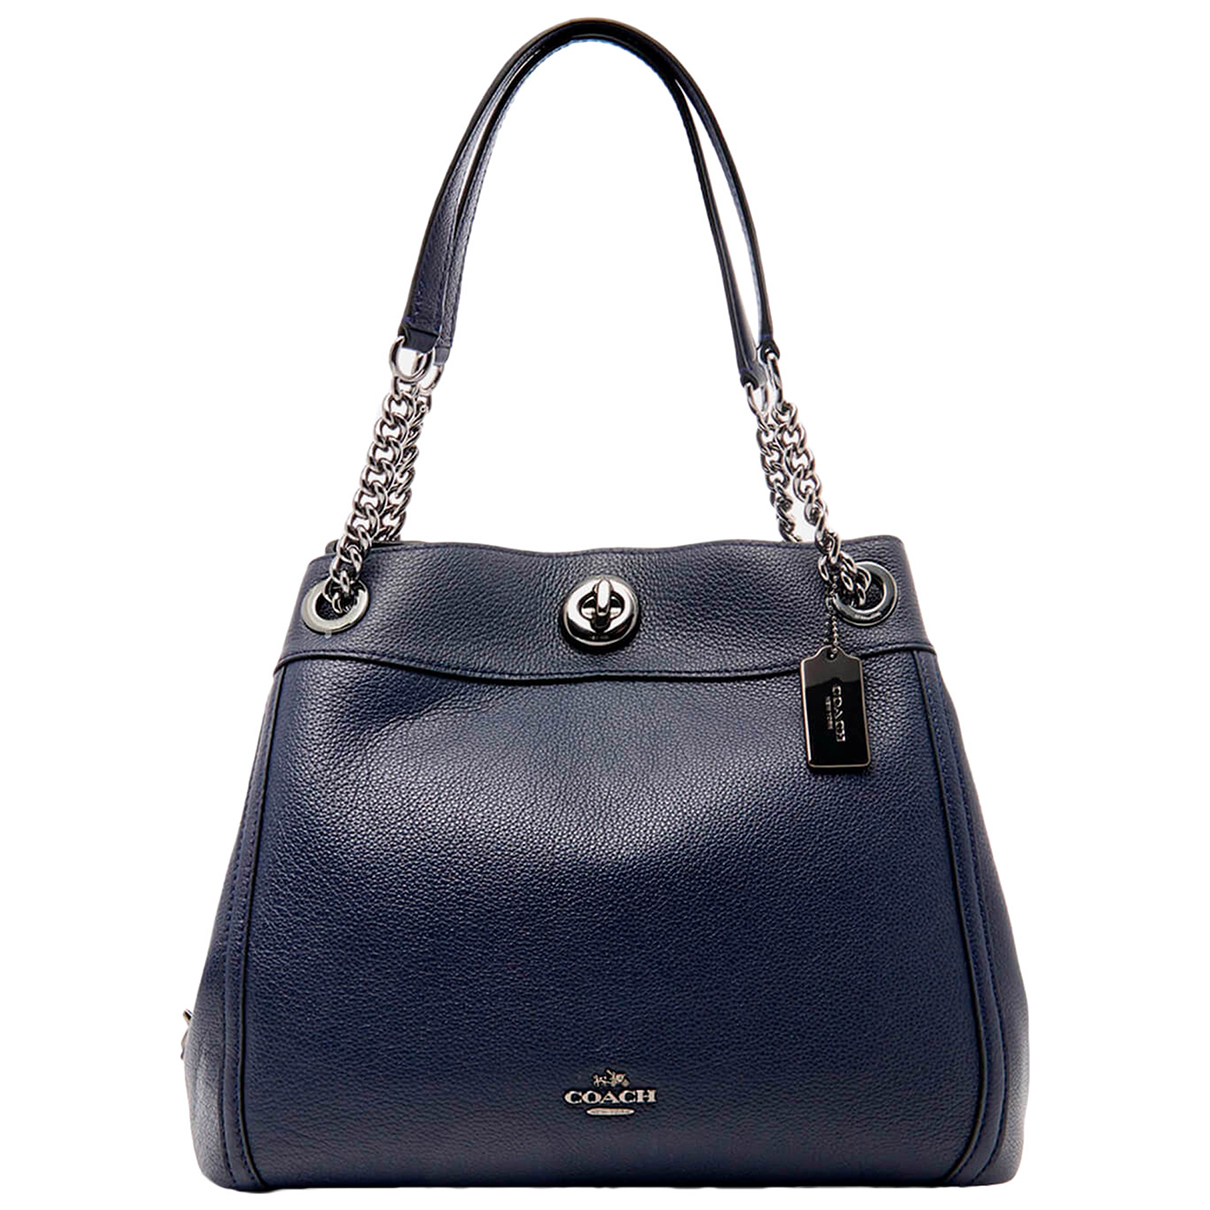 Coach Edie Navy Leather handbag for Women N